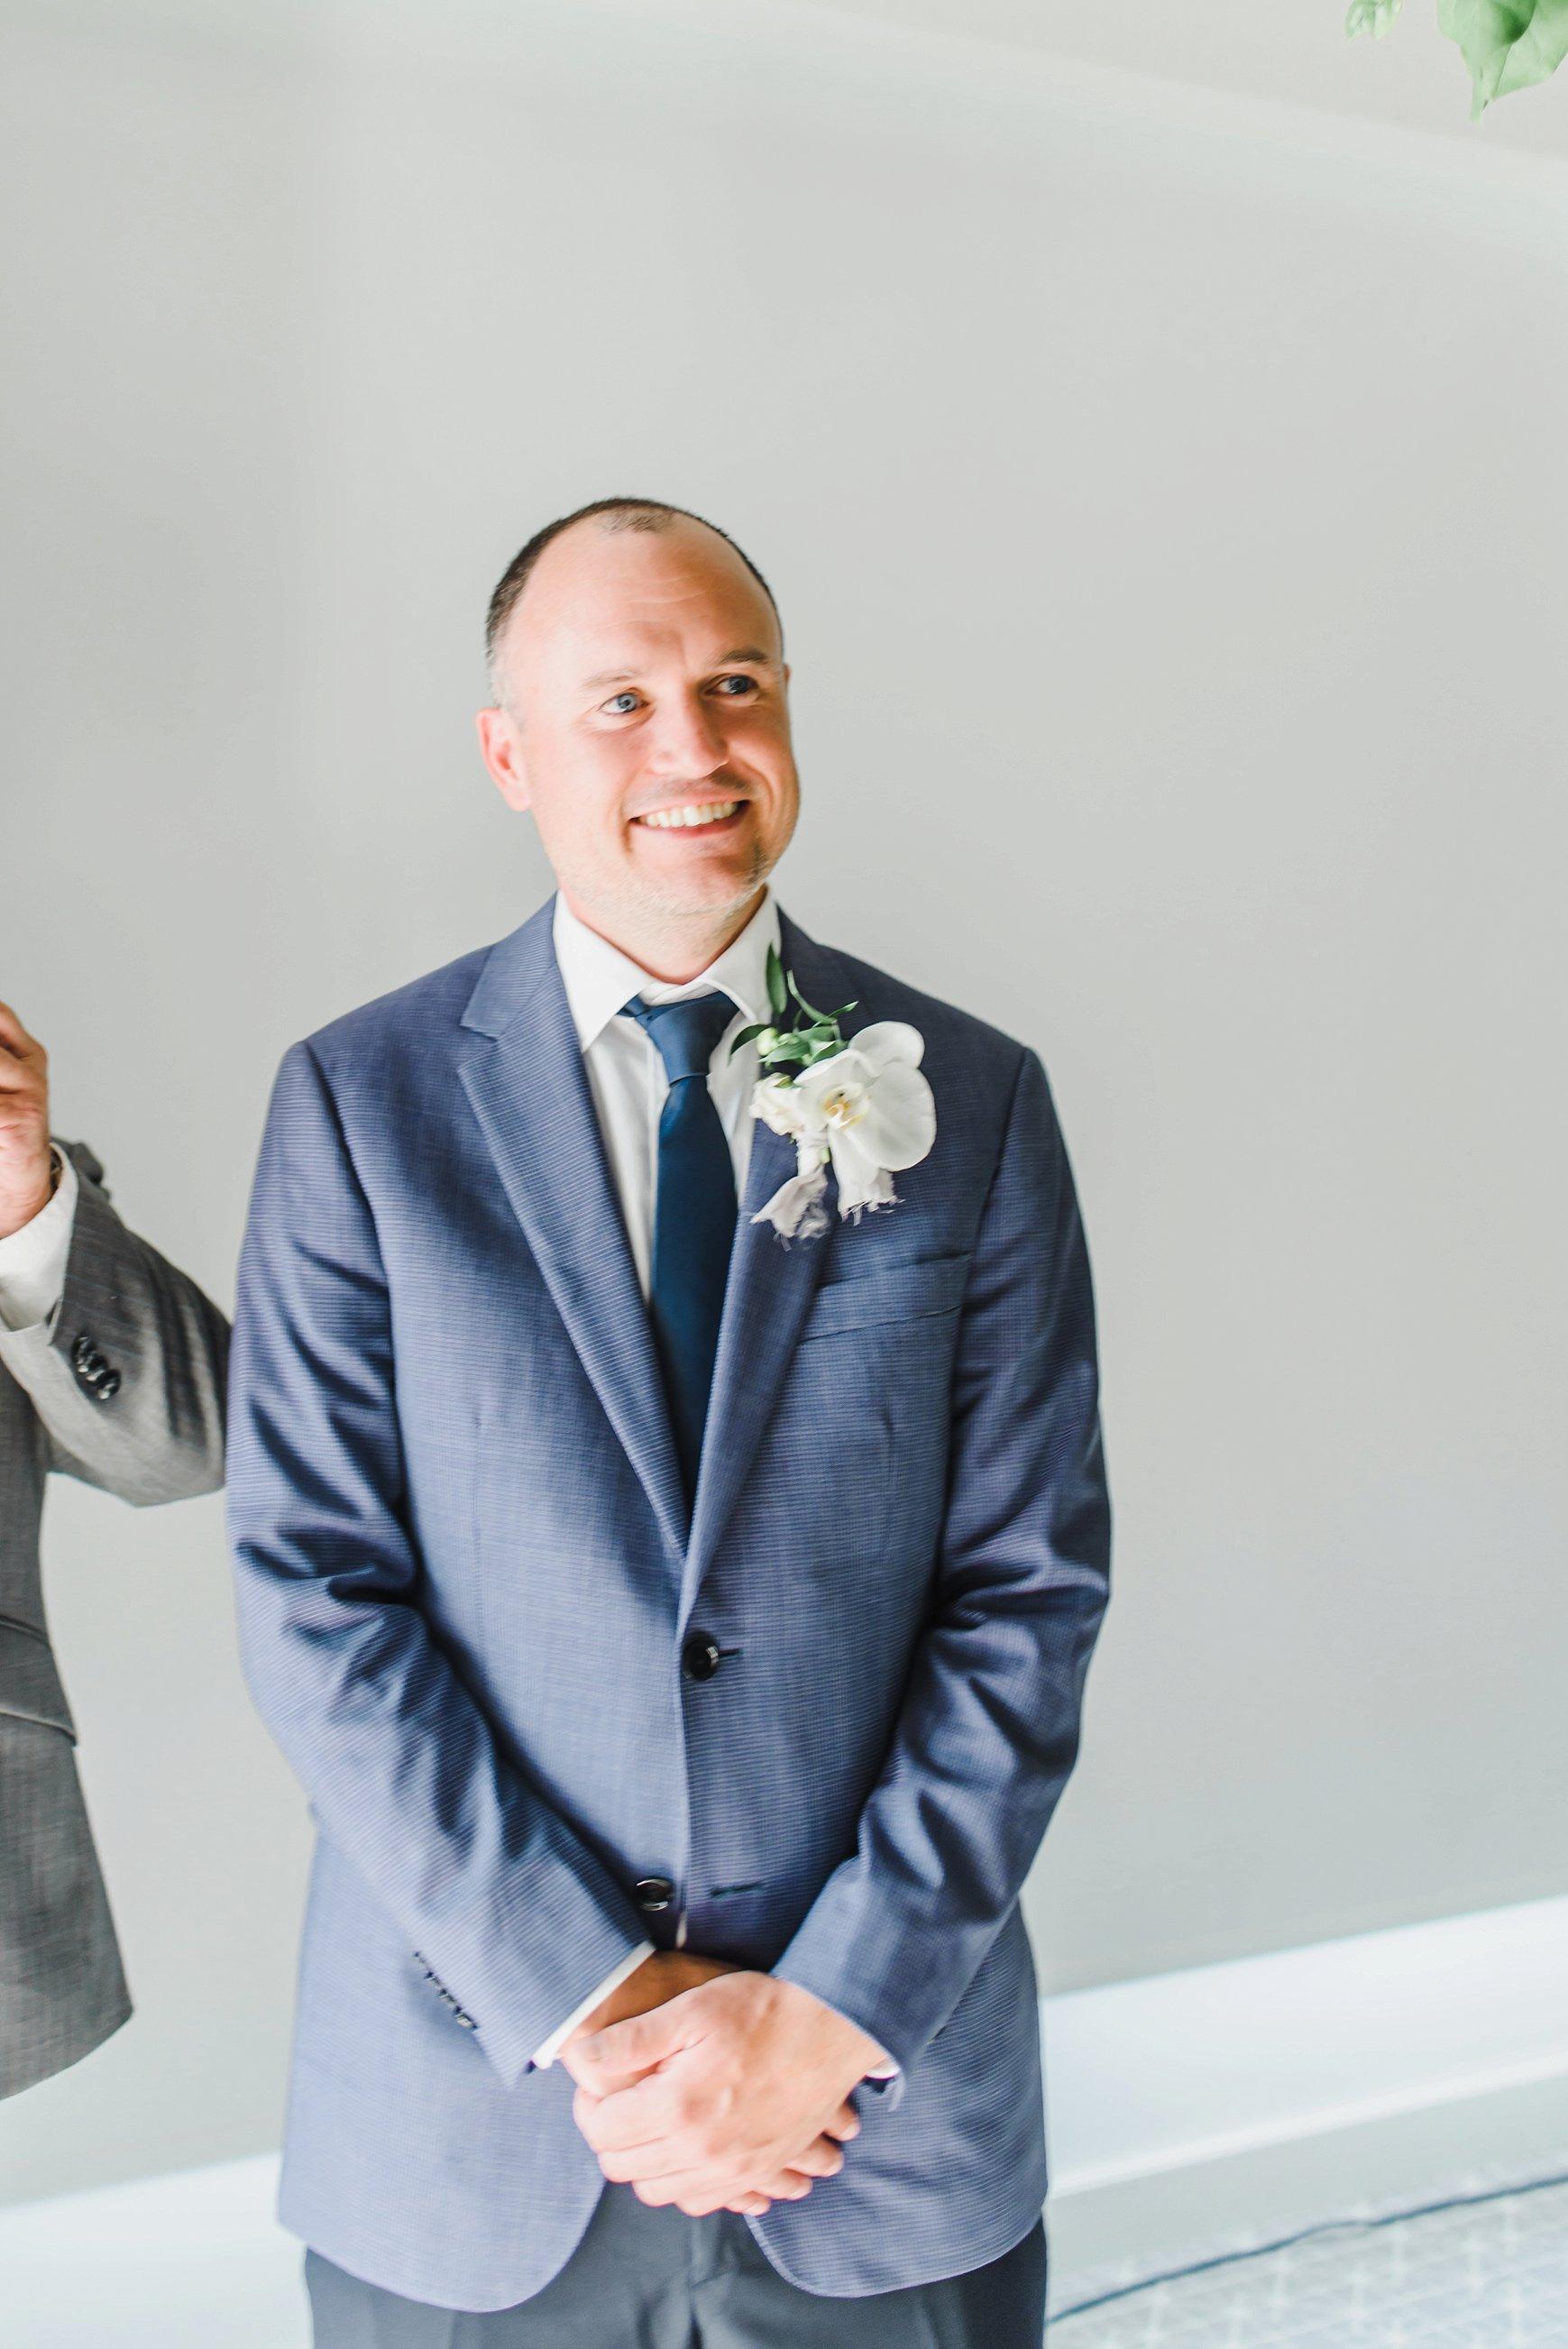 light airy indie fine art ottawa wedding photographer | Ali and Batoul Photography_0678.jpg